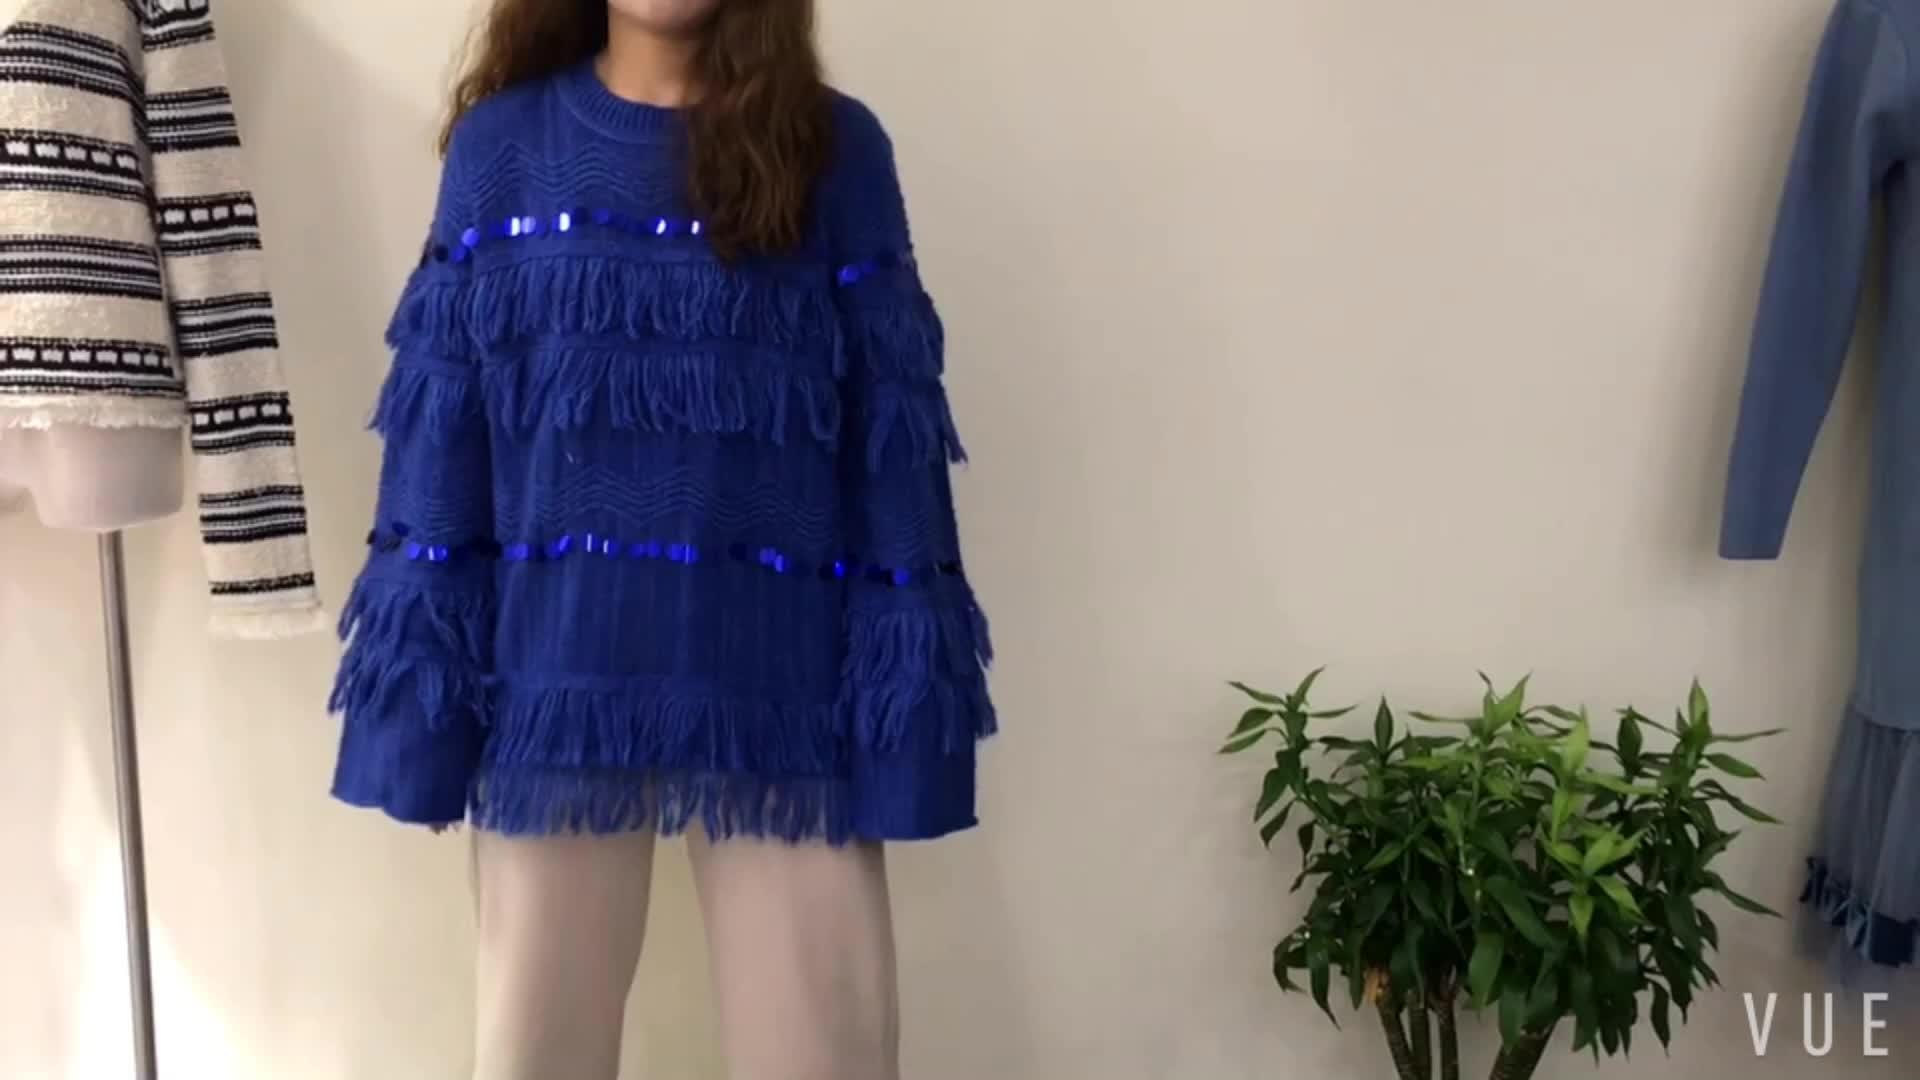 Borla lentejuelas larga manga de moda suave Jersey suéter elegante